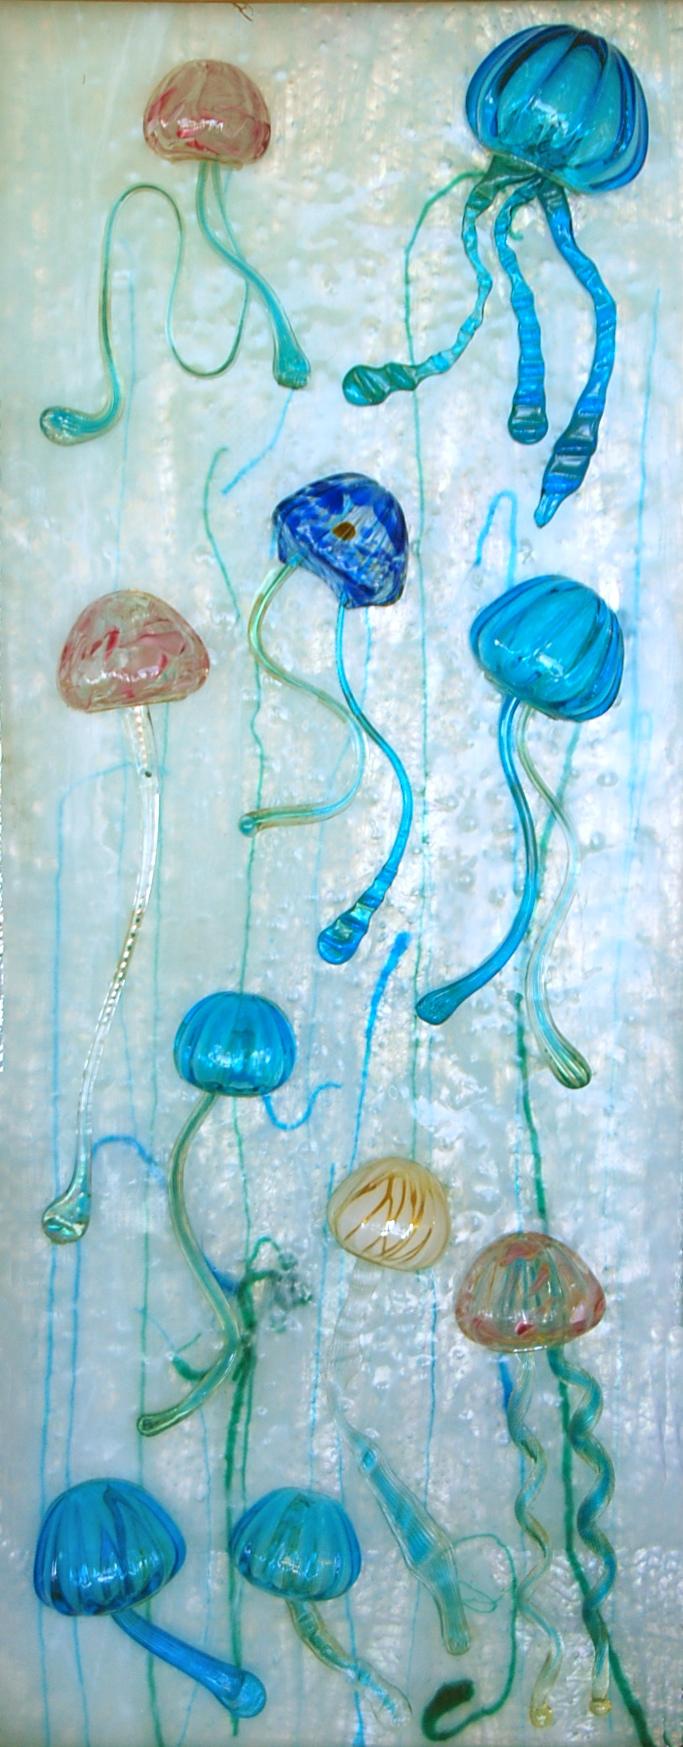 jellyfishnichestrini02.jpg